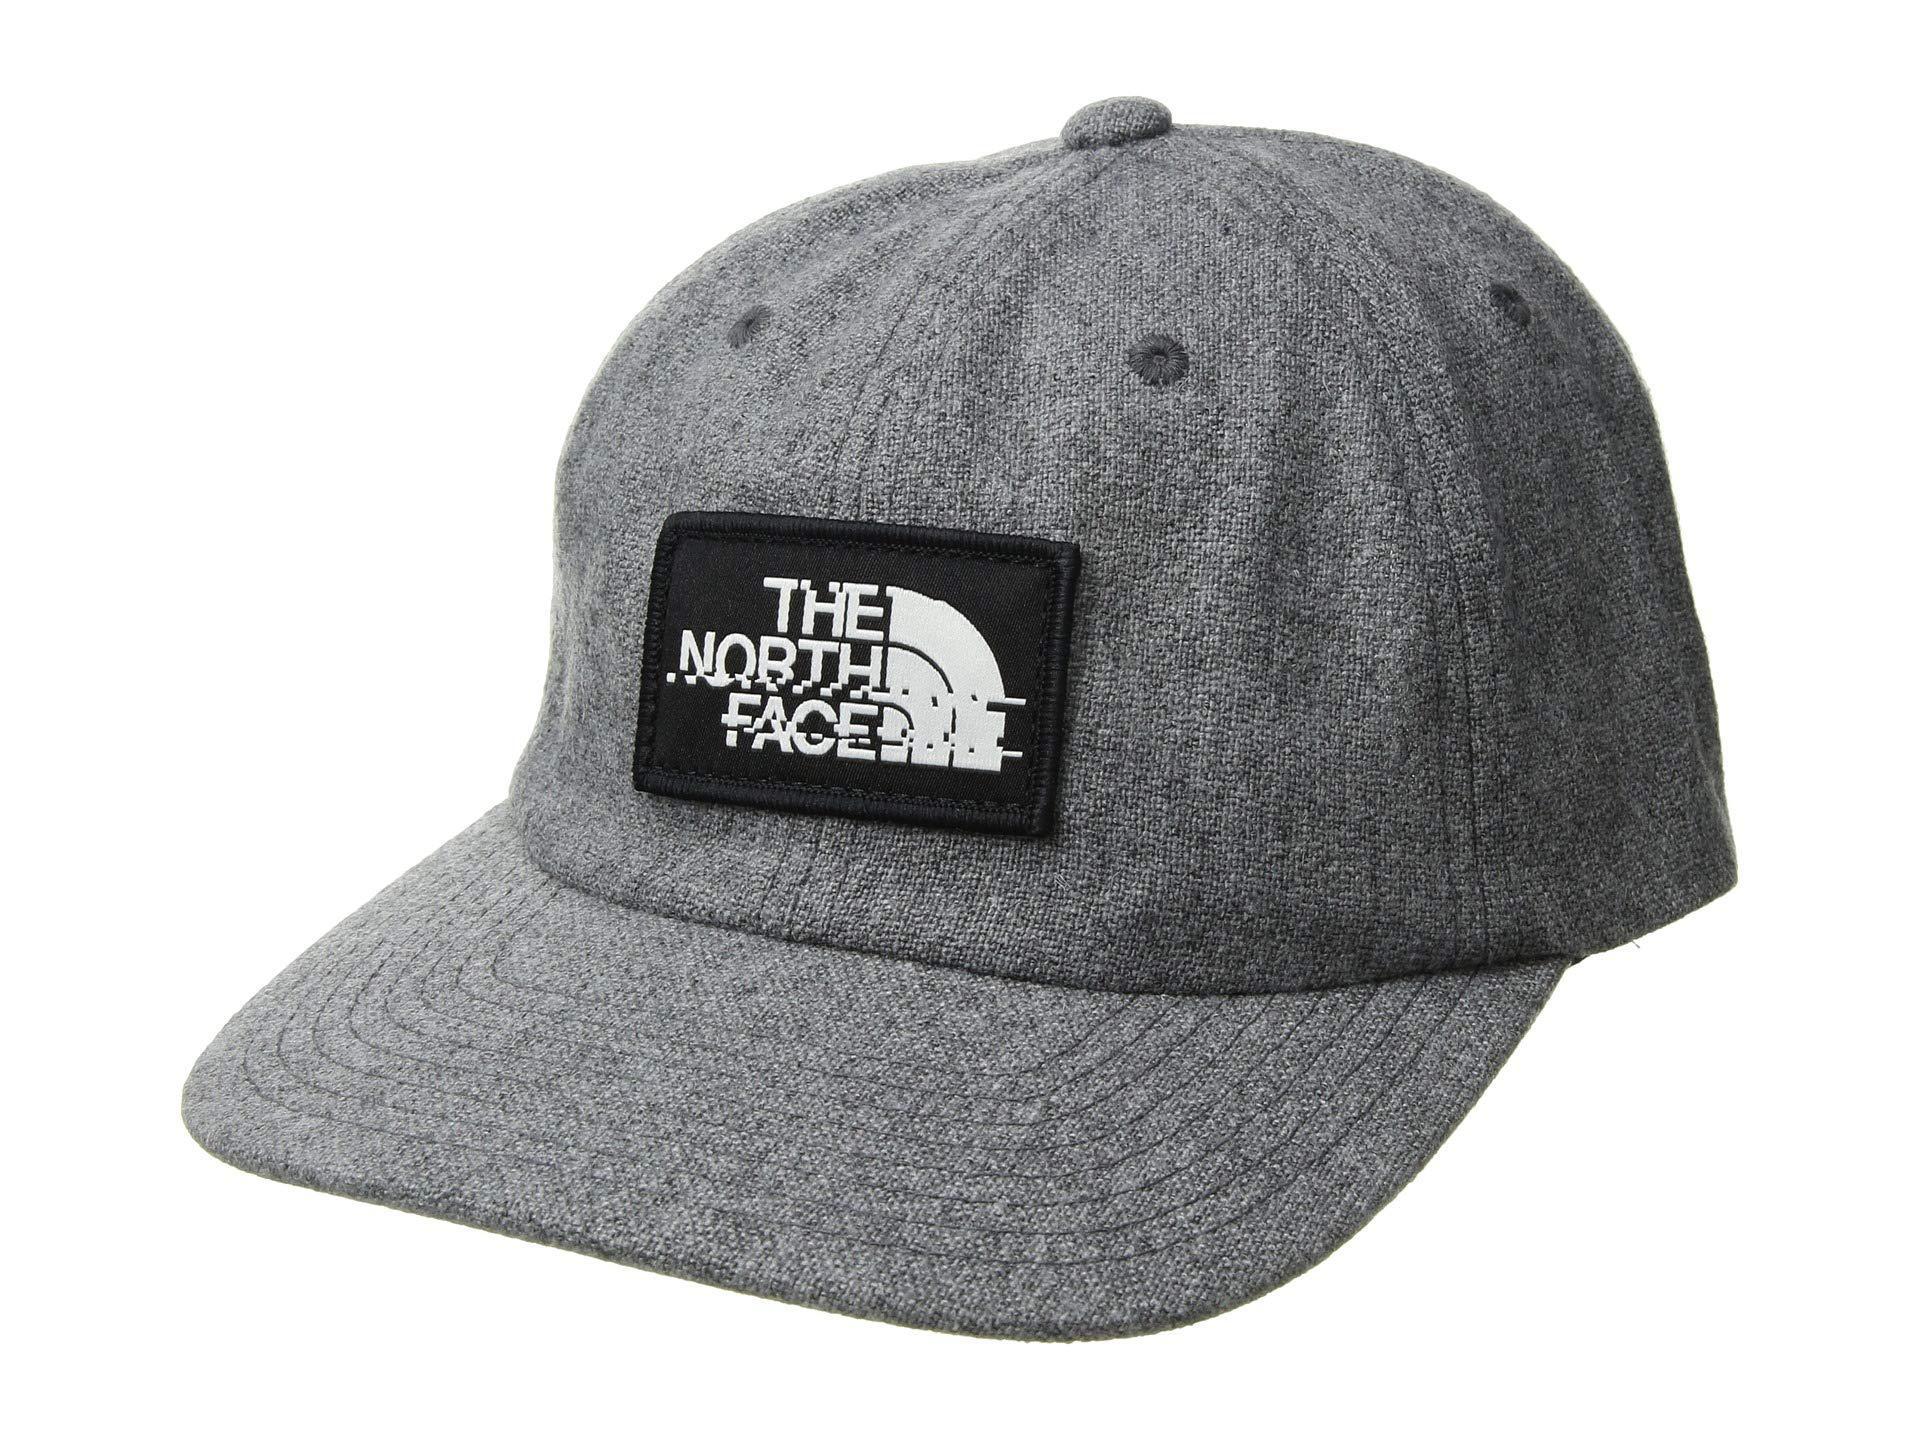 b9bbf1b0f64 Lyst - The North Face Wool Ball Cap (tnf Medium Grey Heather tnf ...